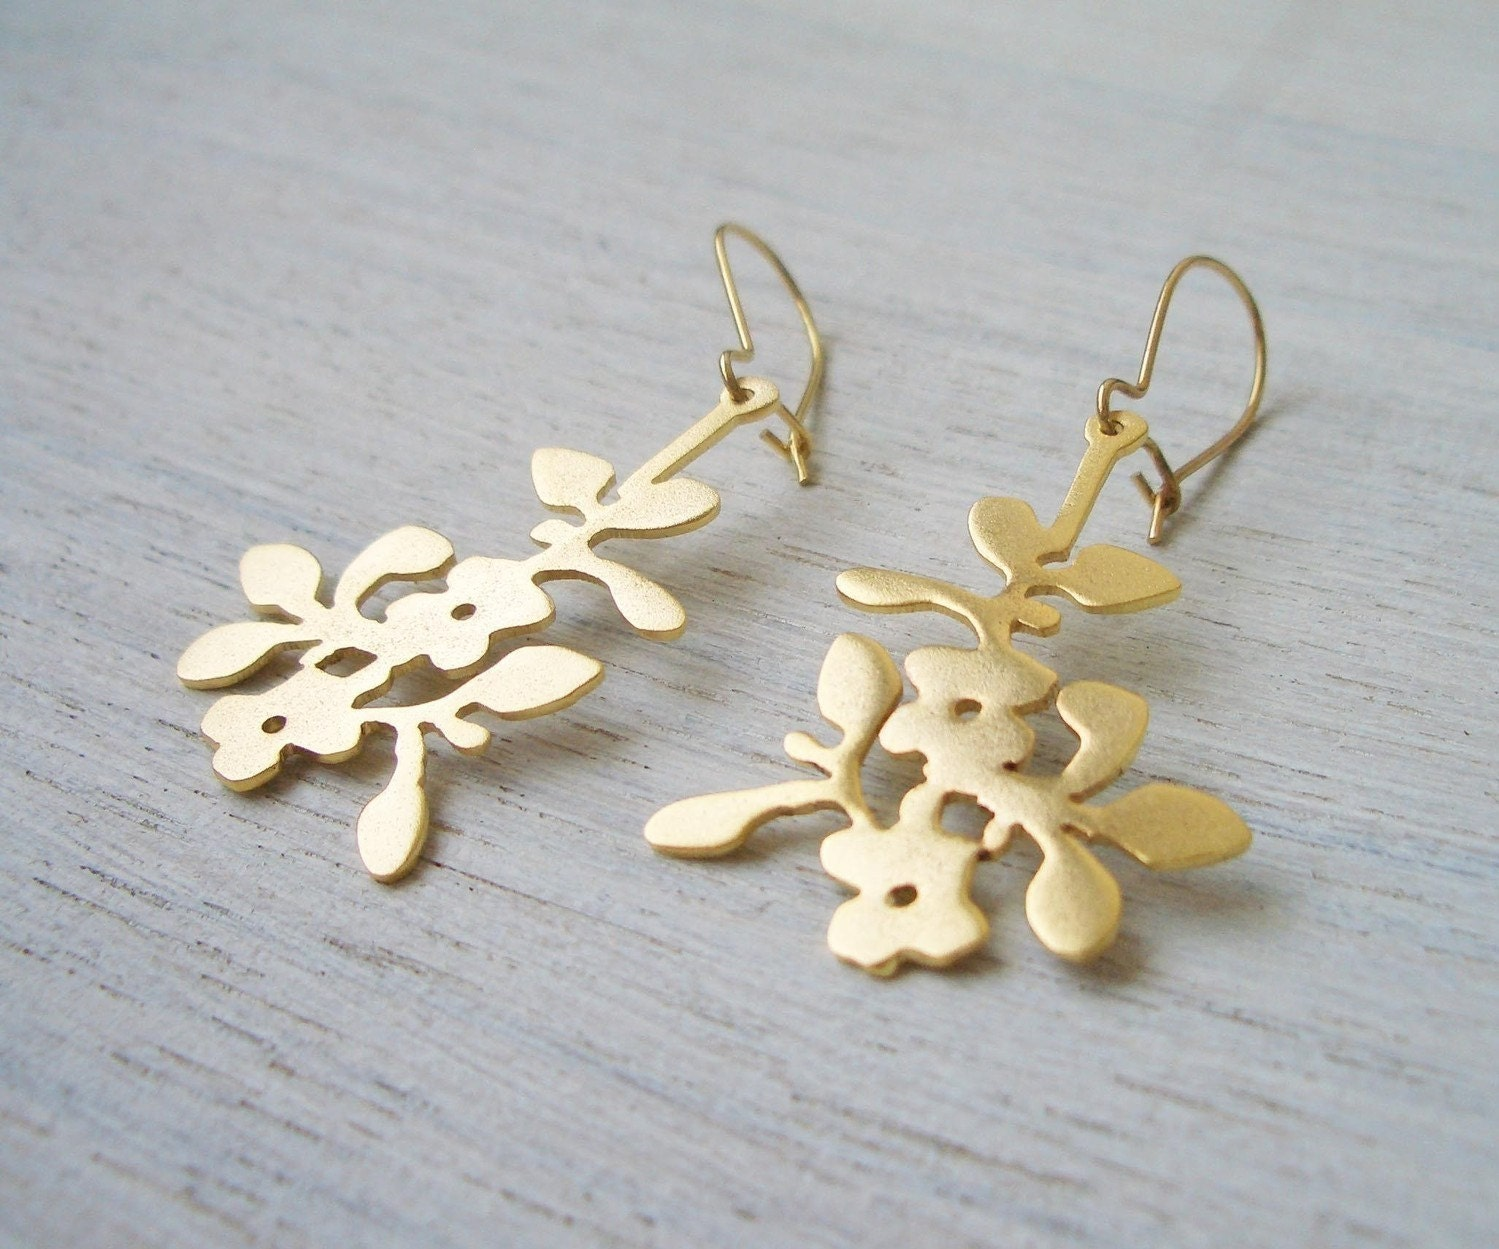 Geranium Earrings in Matte Gold